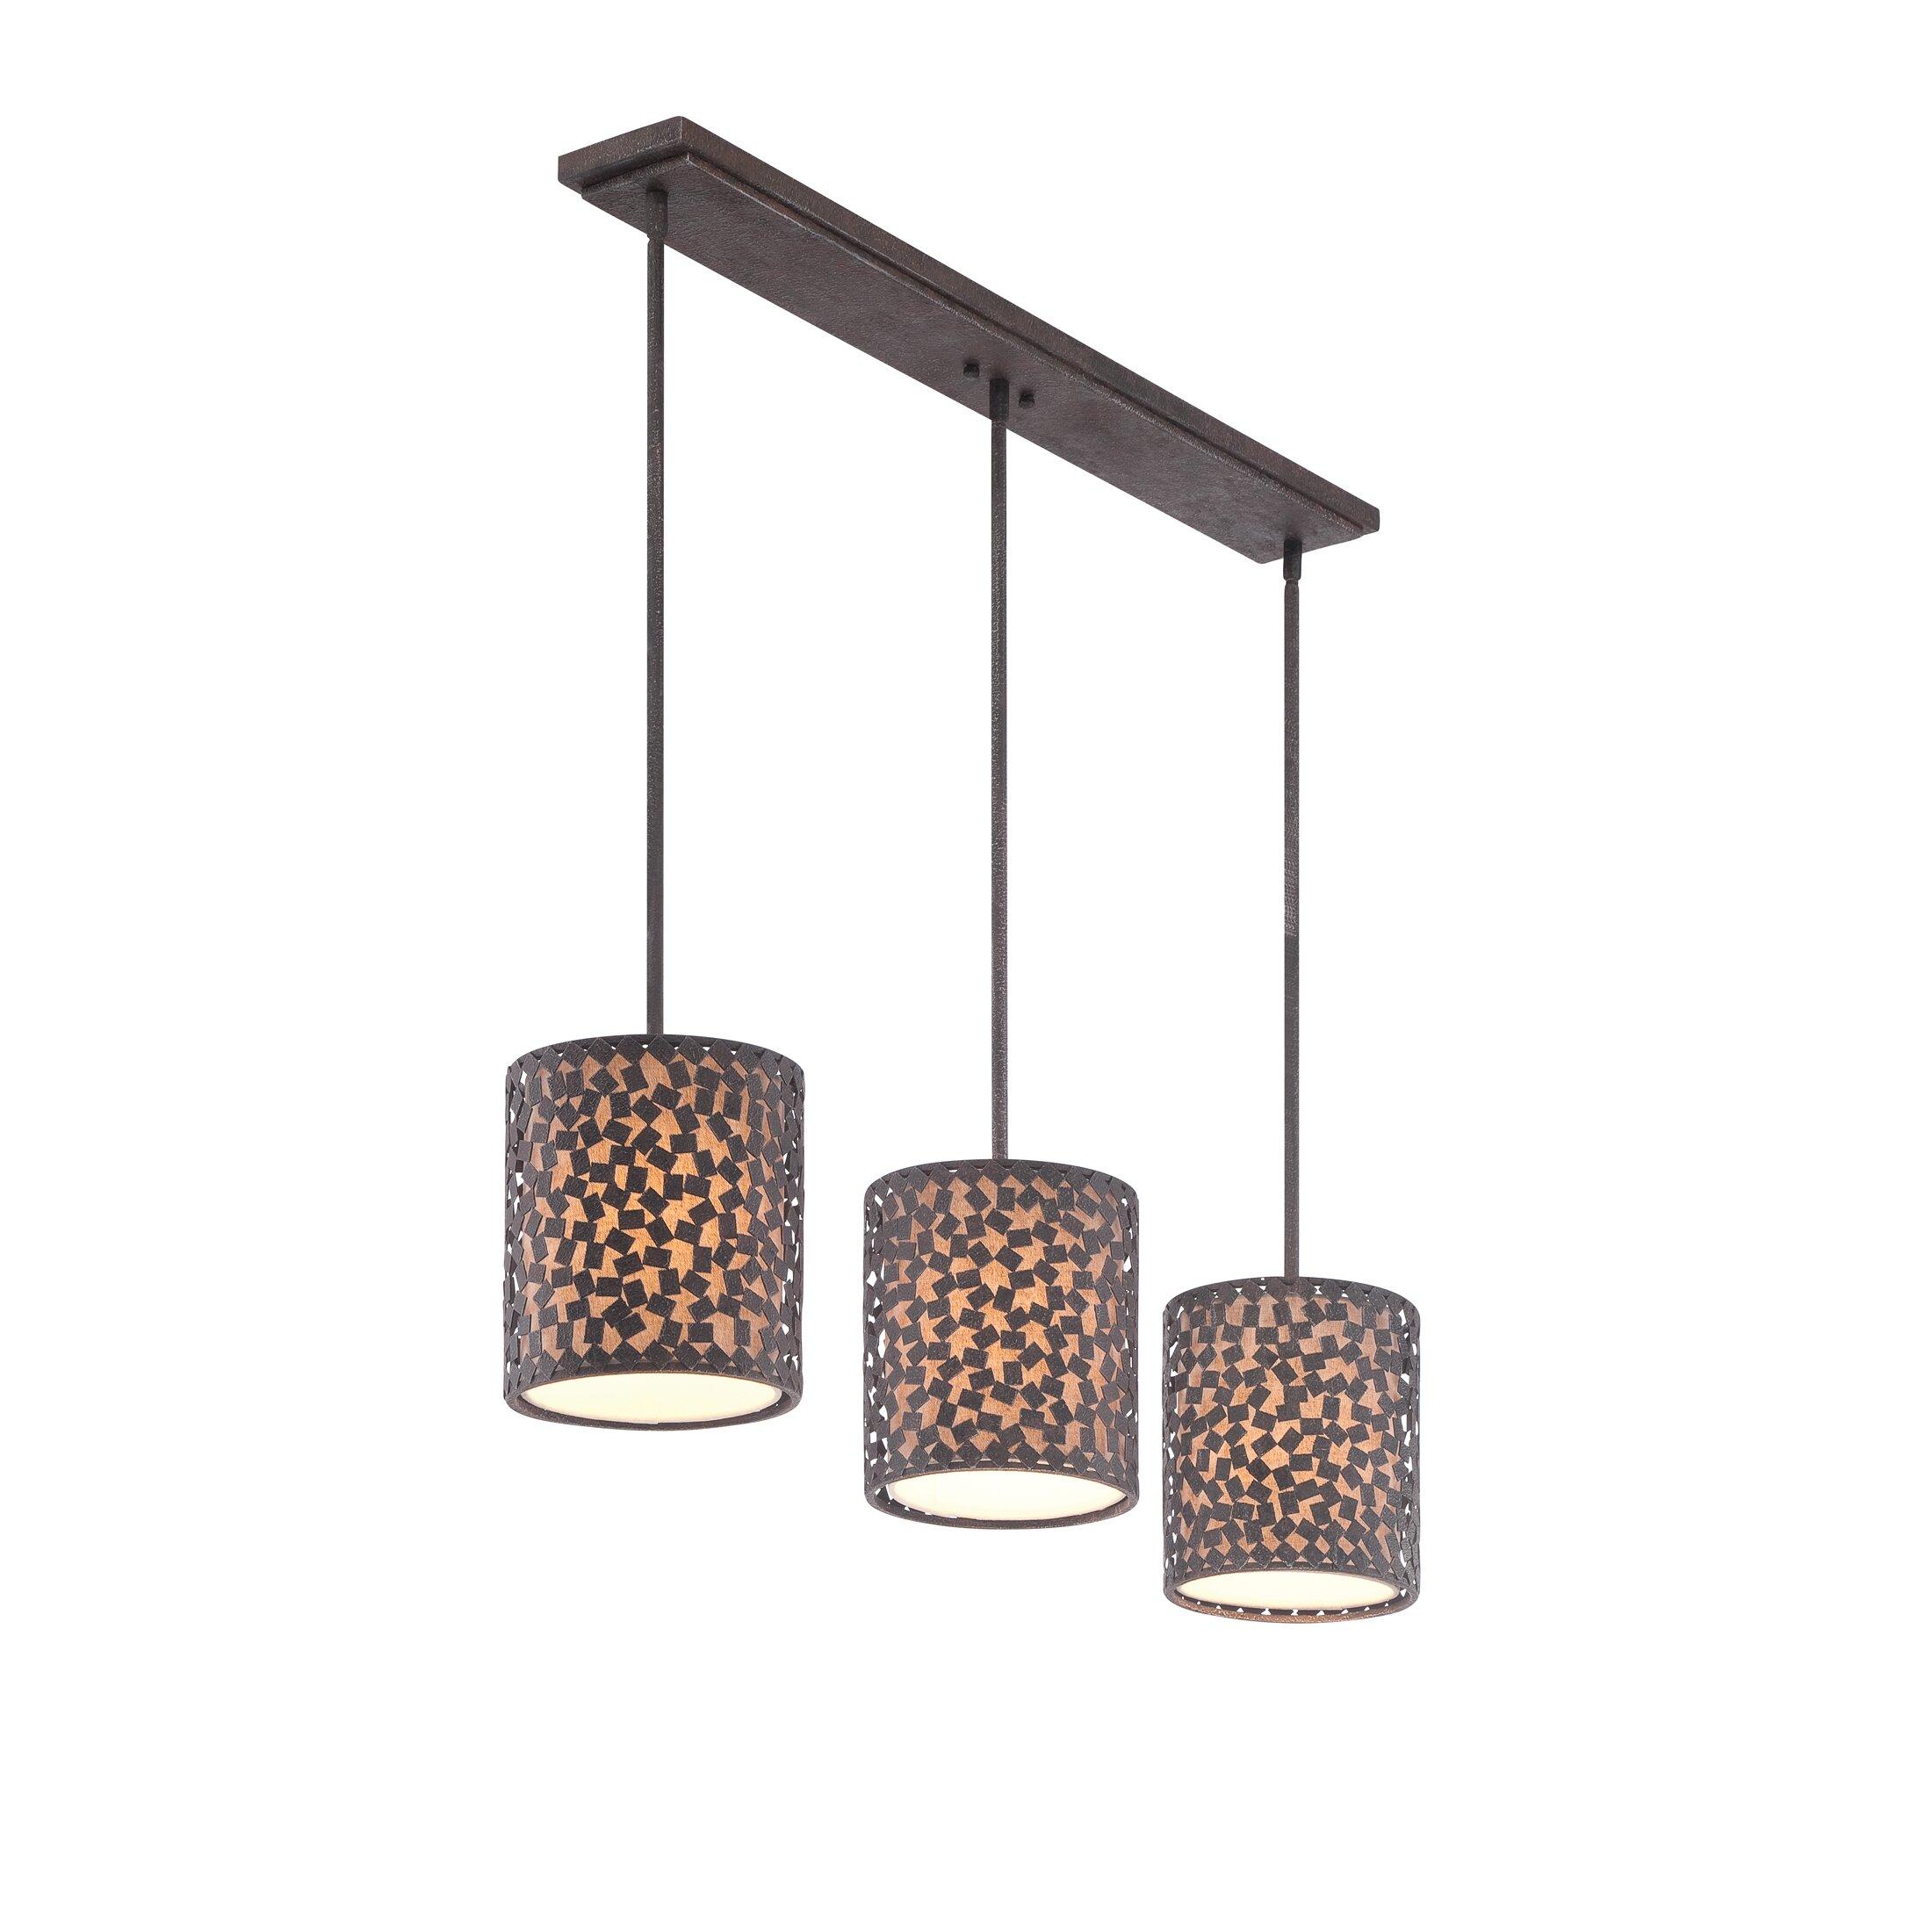 Glass Pendant Lights For Kitchen Island